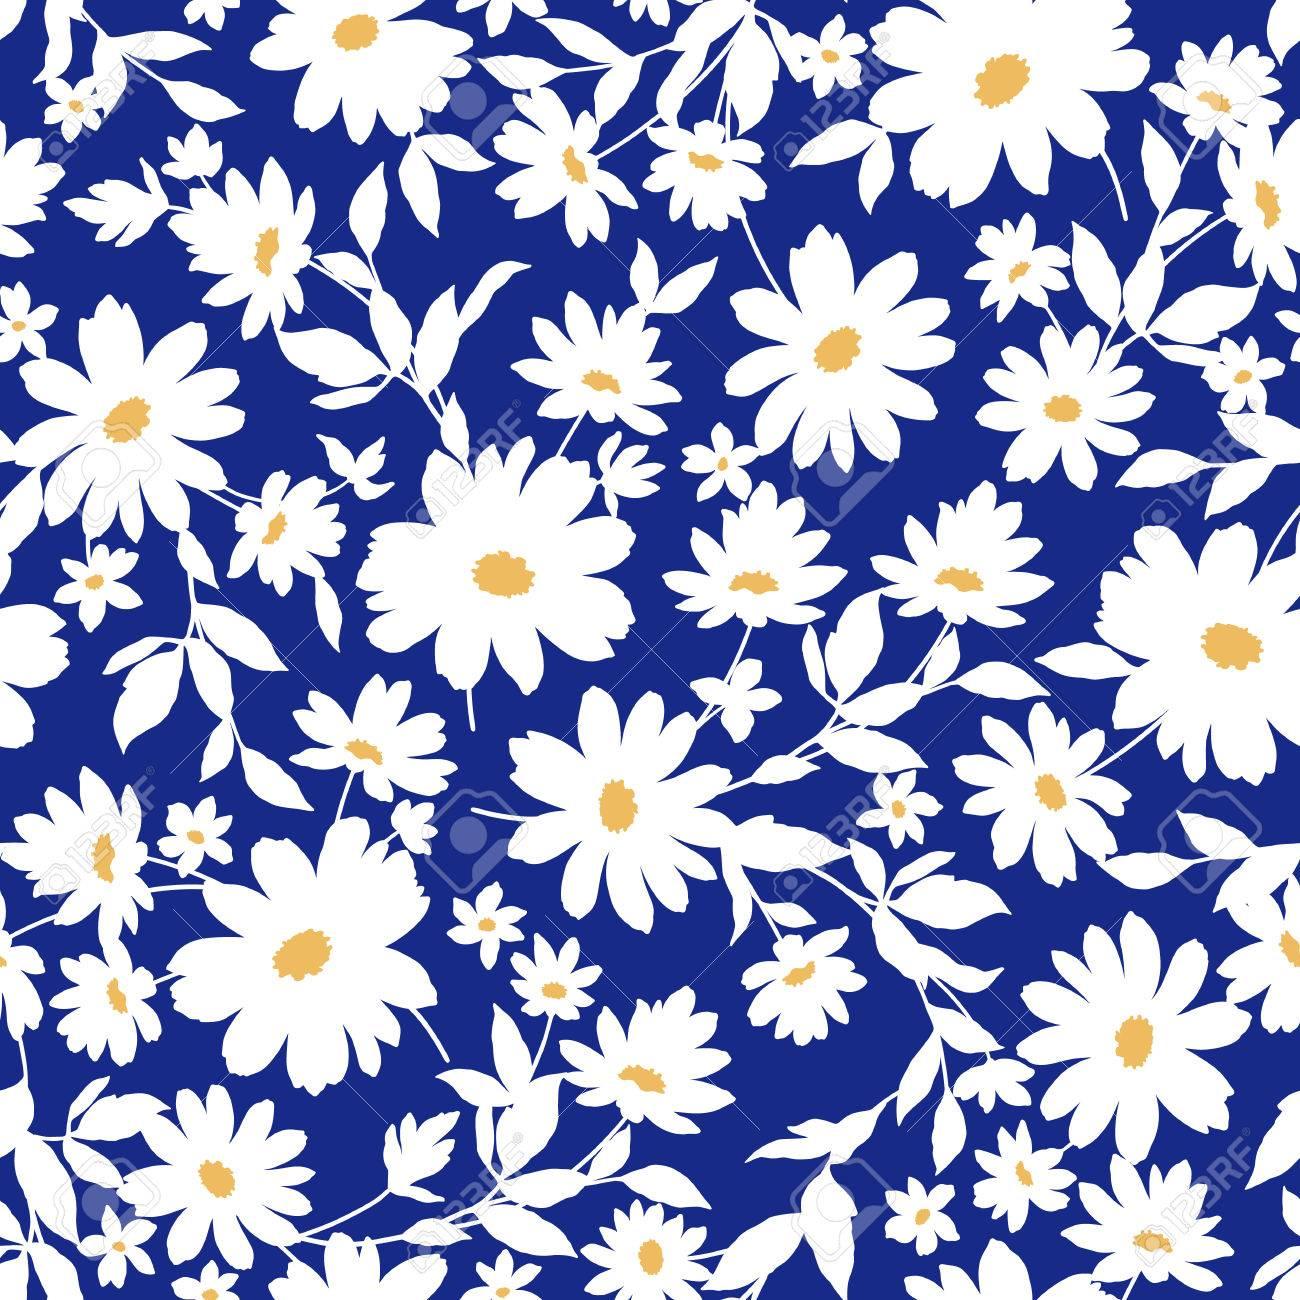 Flower illustration pattern - 54947465